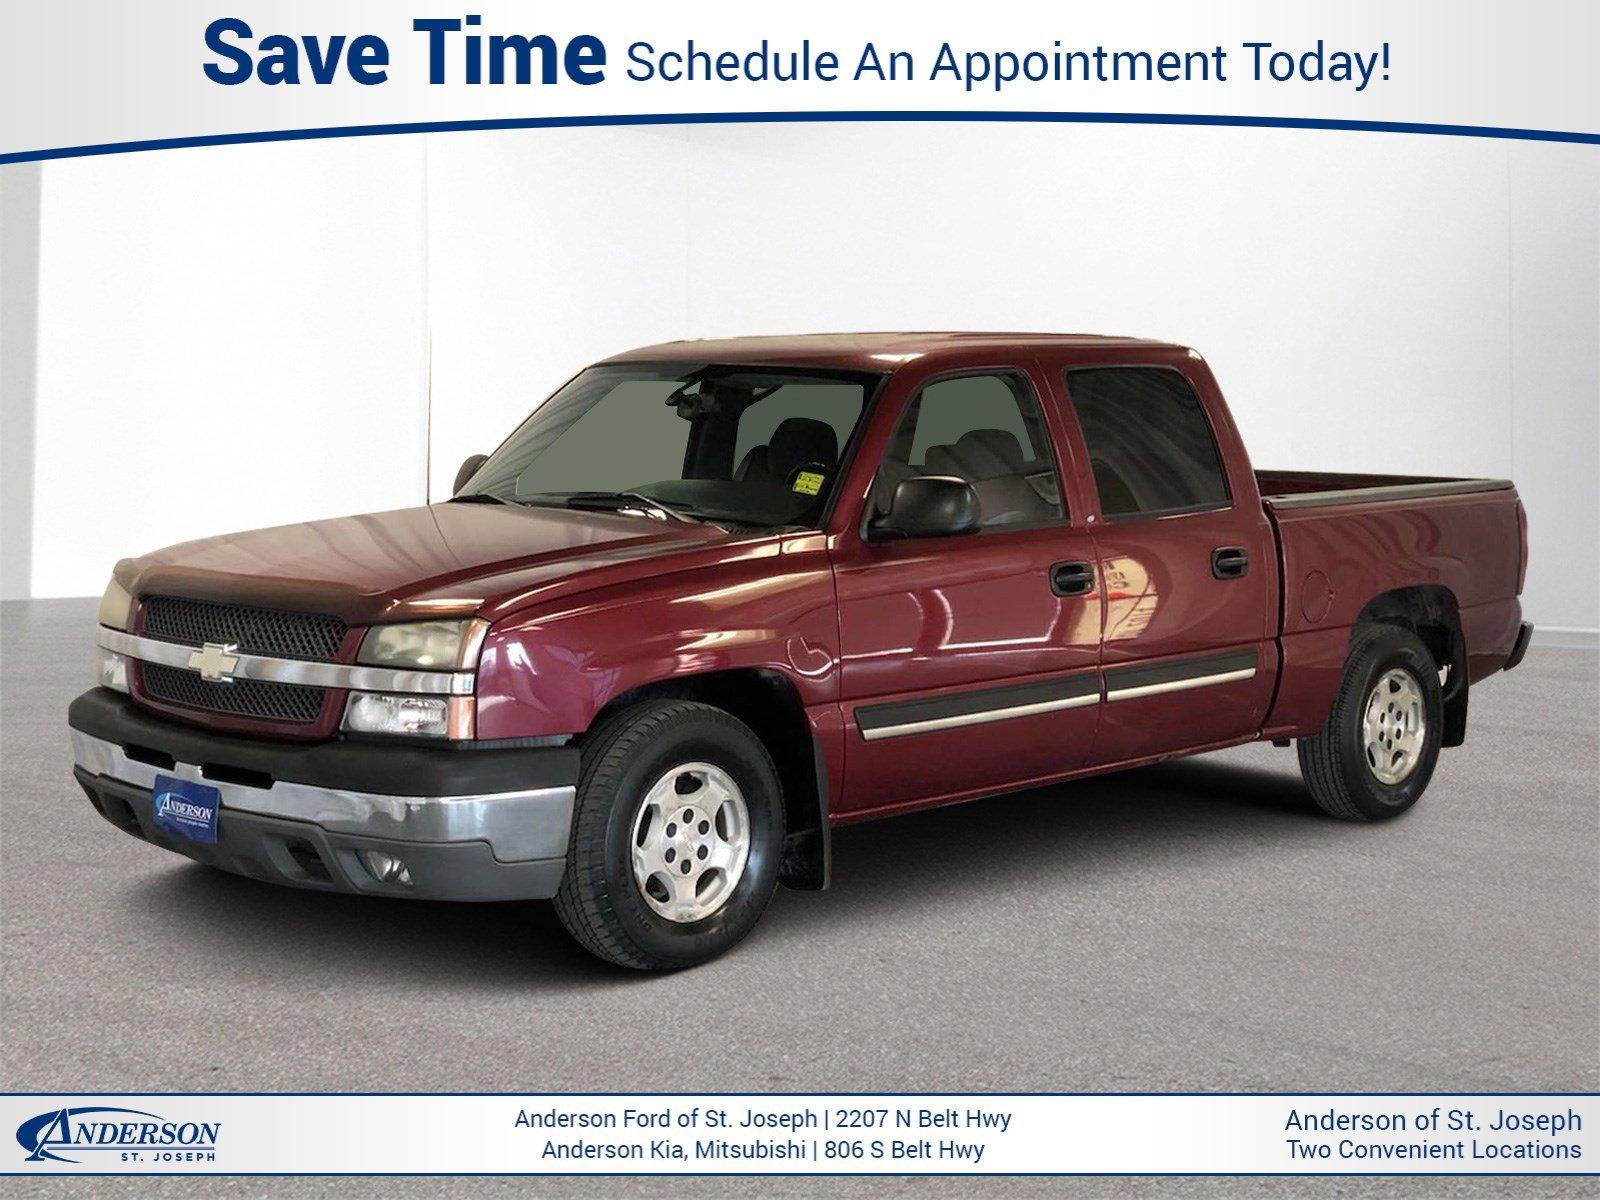 Used 2004 Chevrolet Silverado 1500 Crew Cab LS Crew Cab Pickup for sale in St Joseph MO